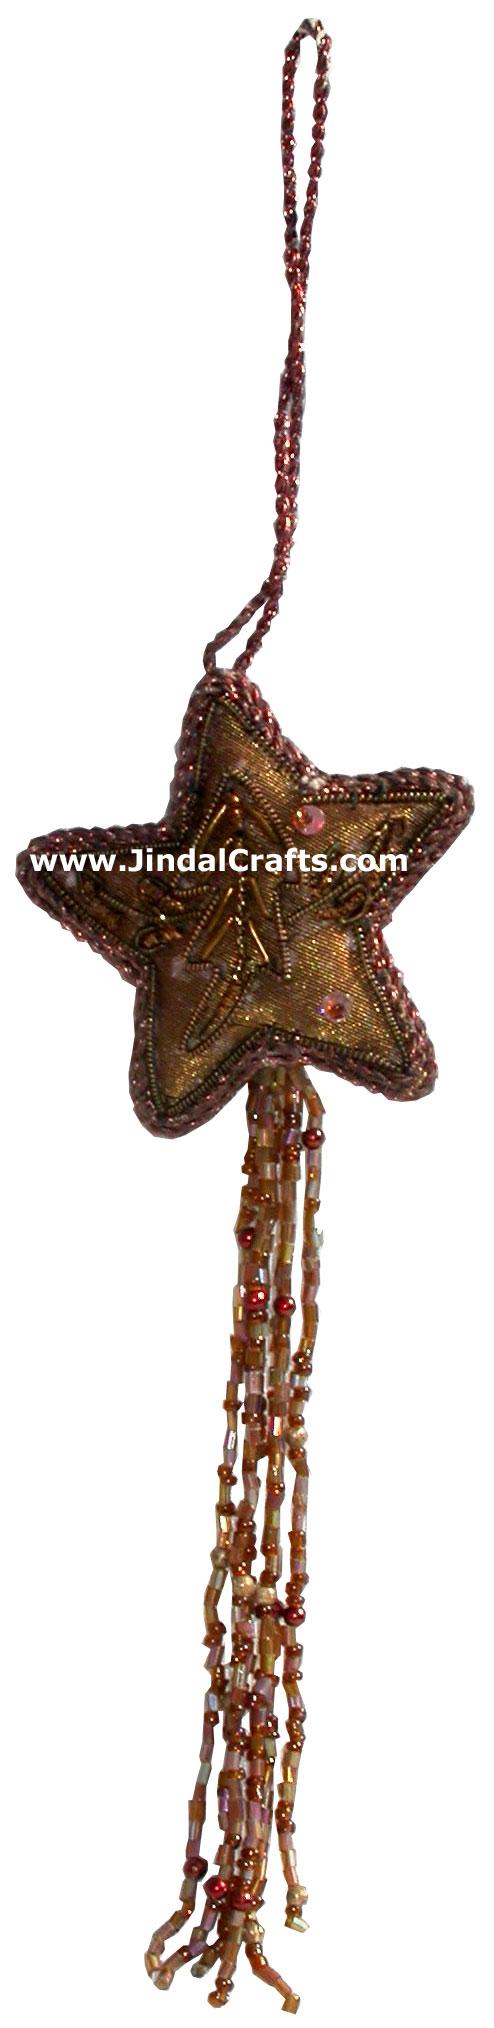 Christmas decorative gt ornaments gt beadwork cotton ornaments